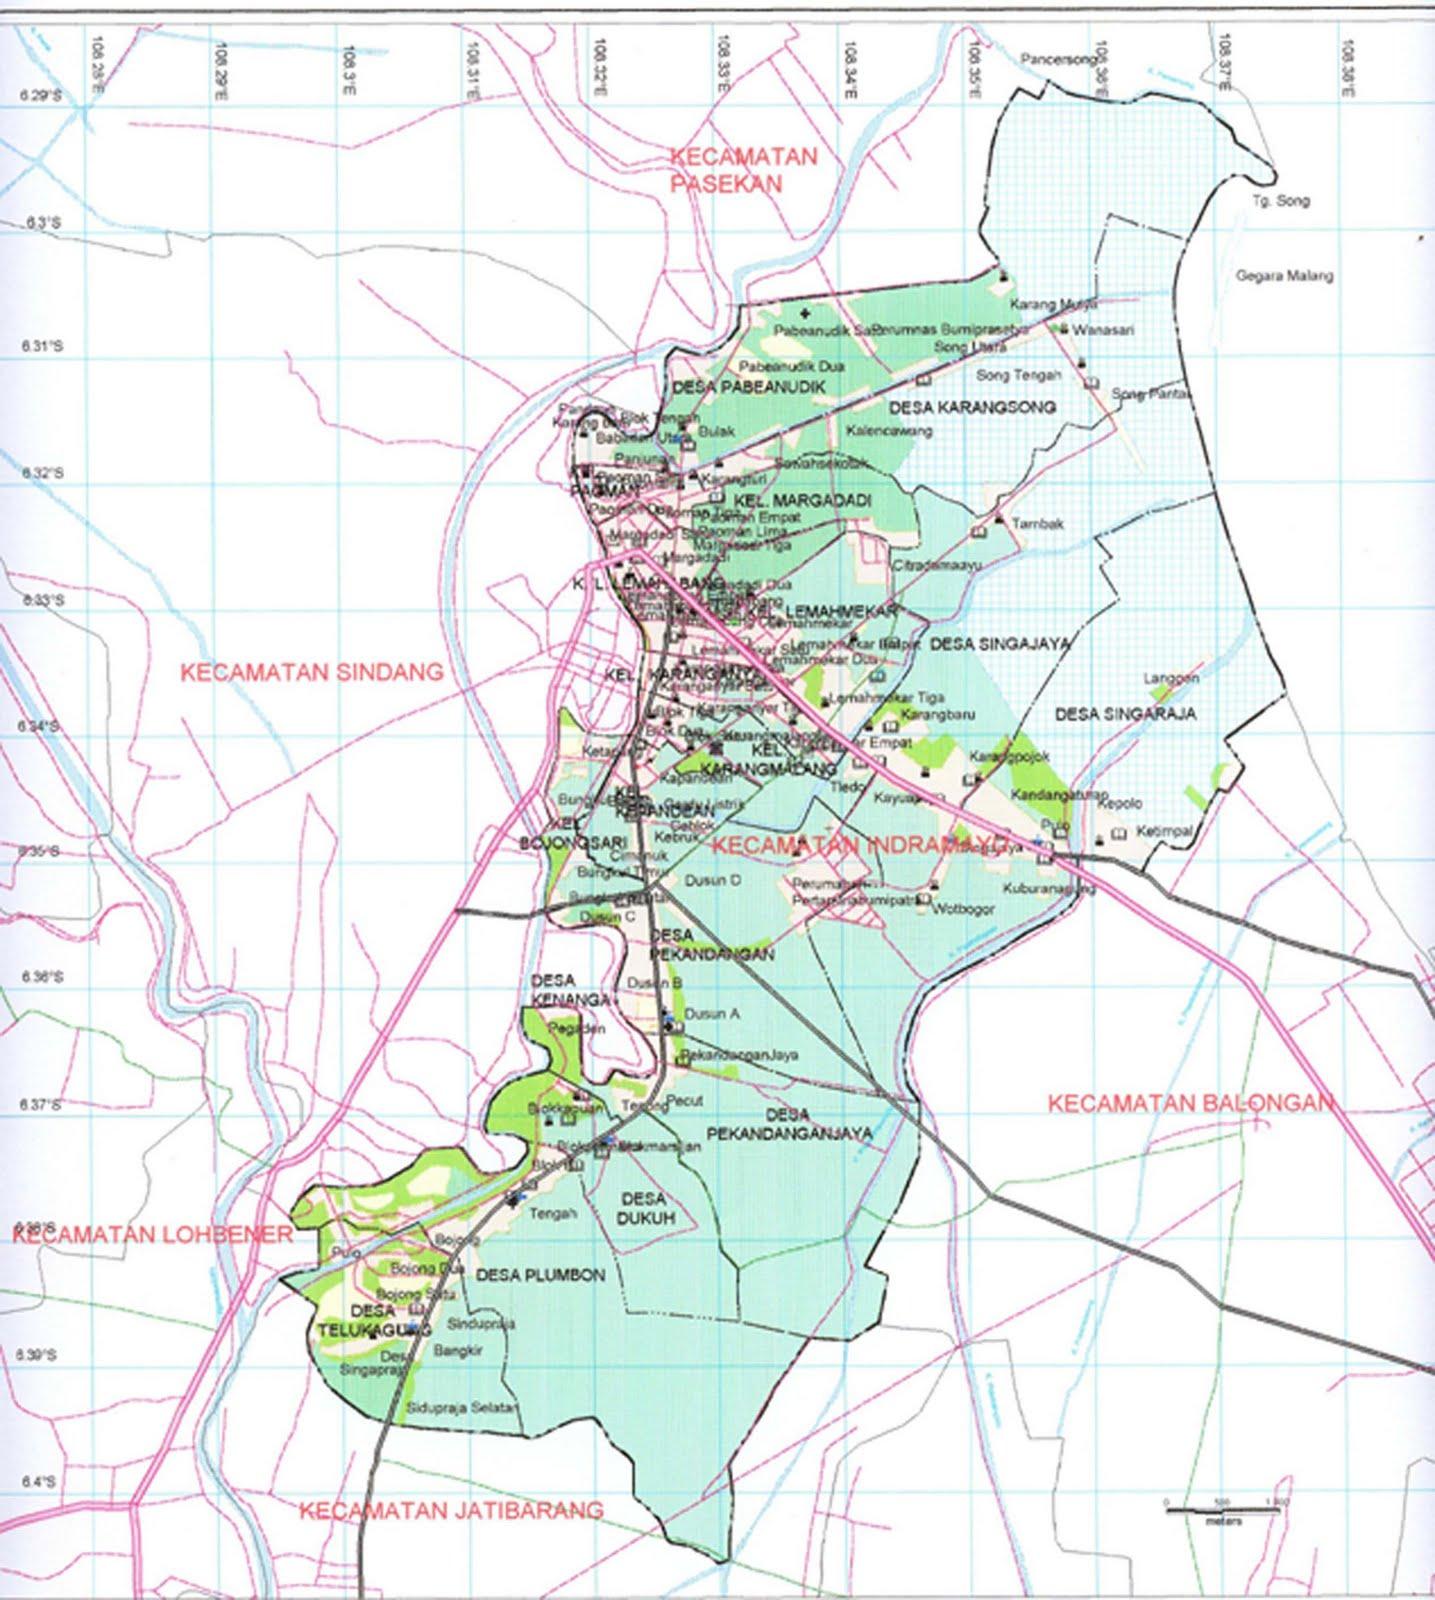 Peta Indramayu